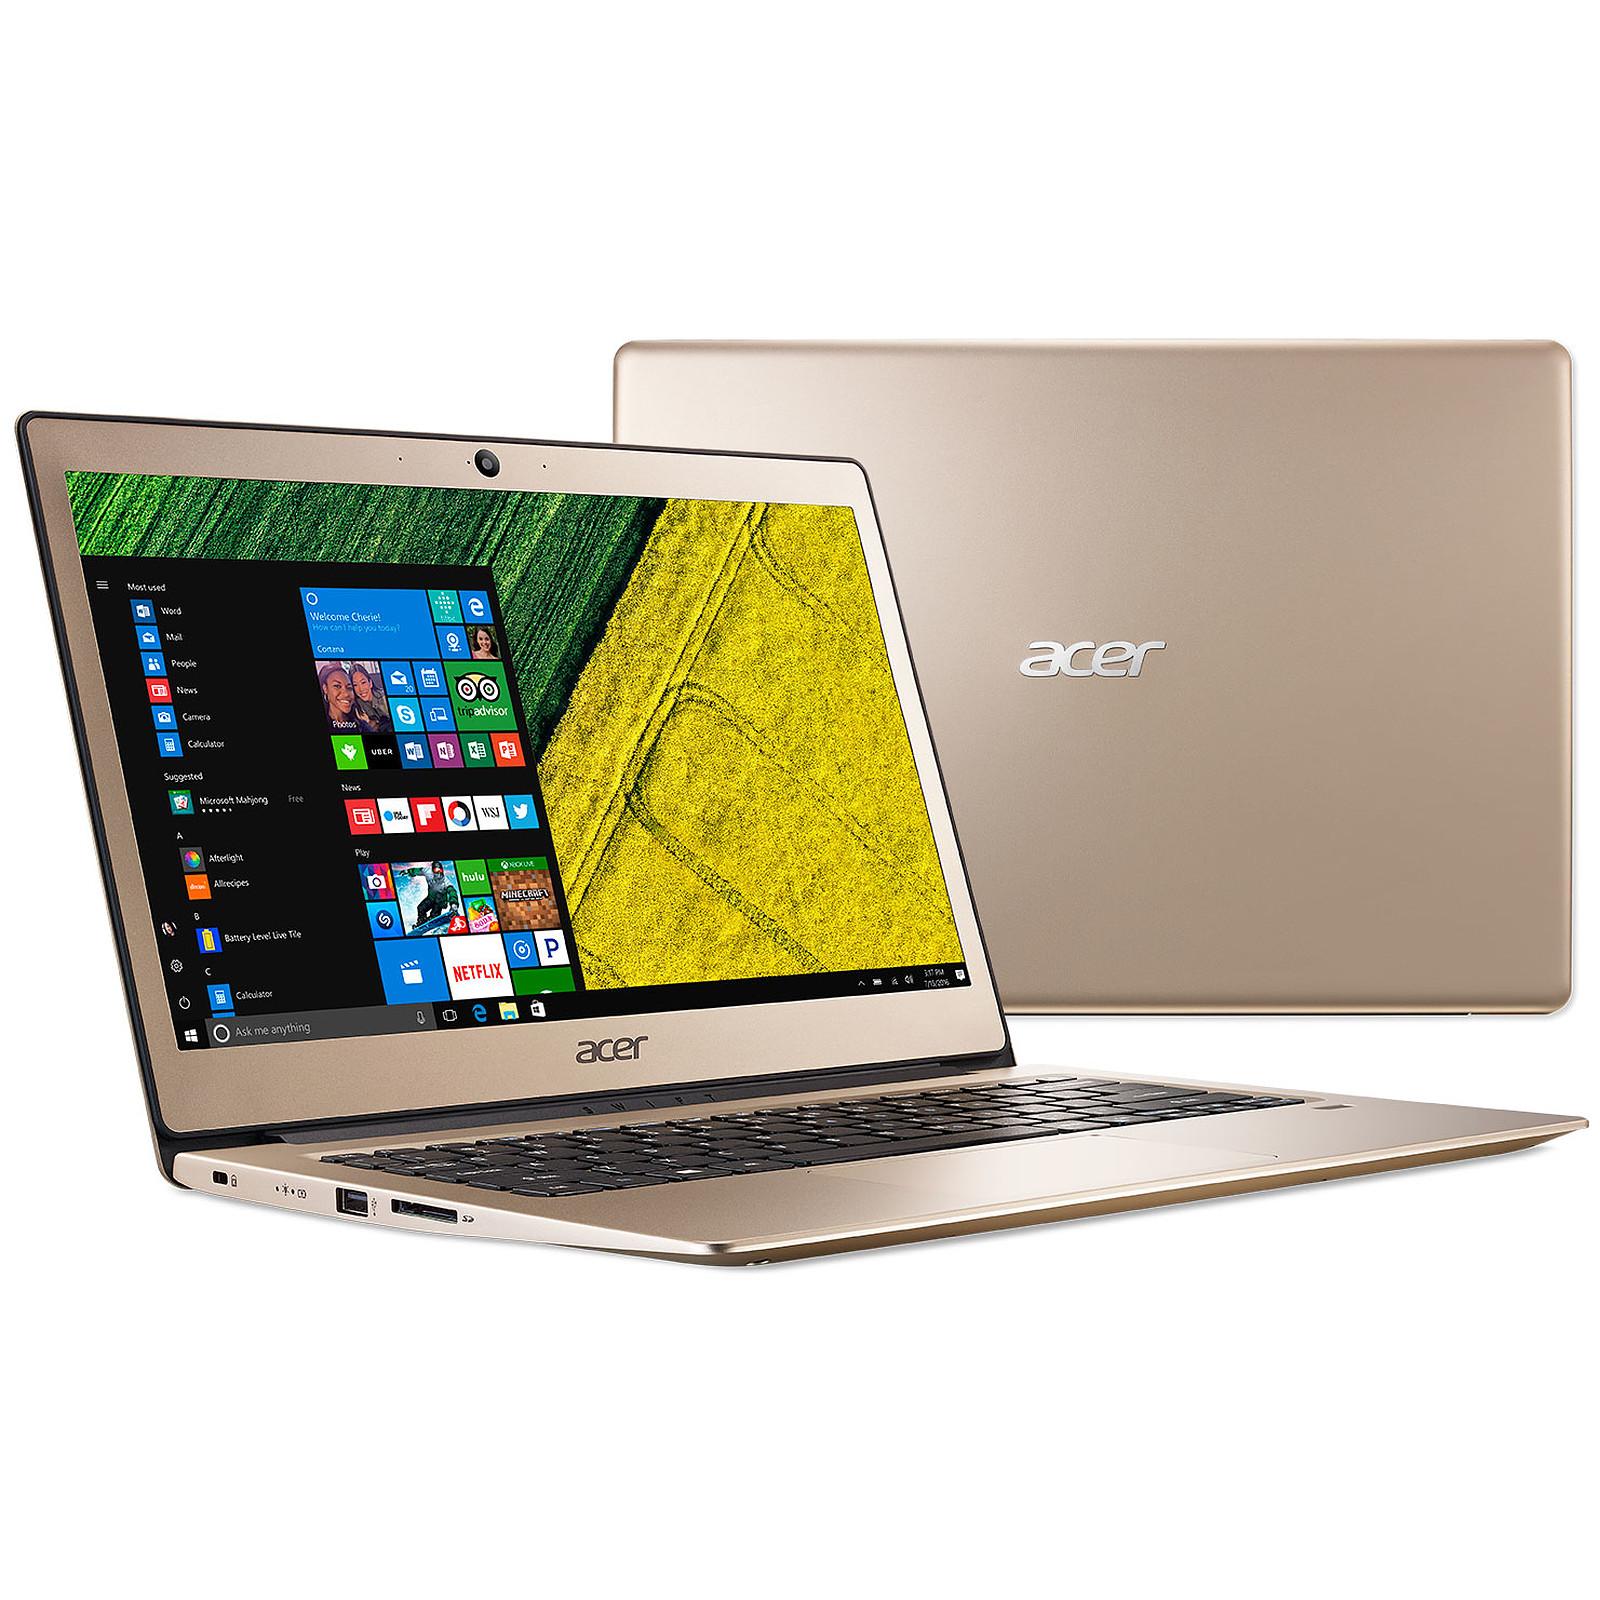 Acer Swift 1 SF113-31-P14U Or